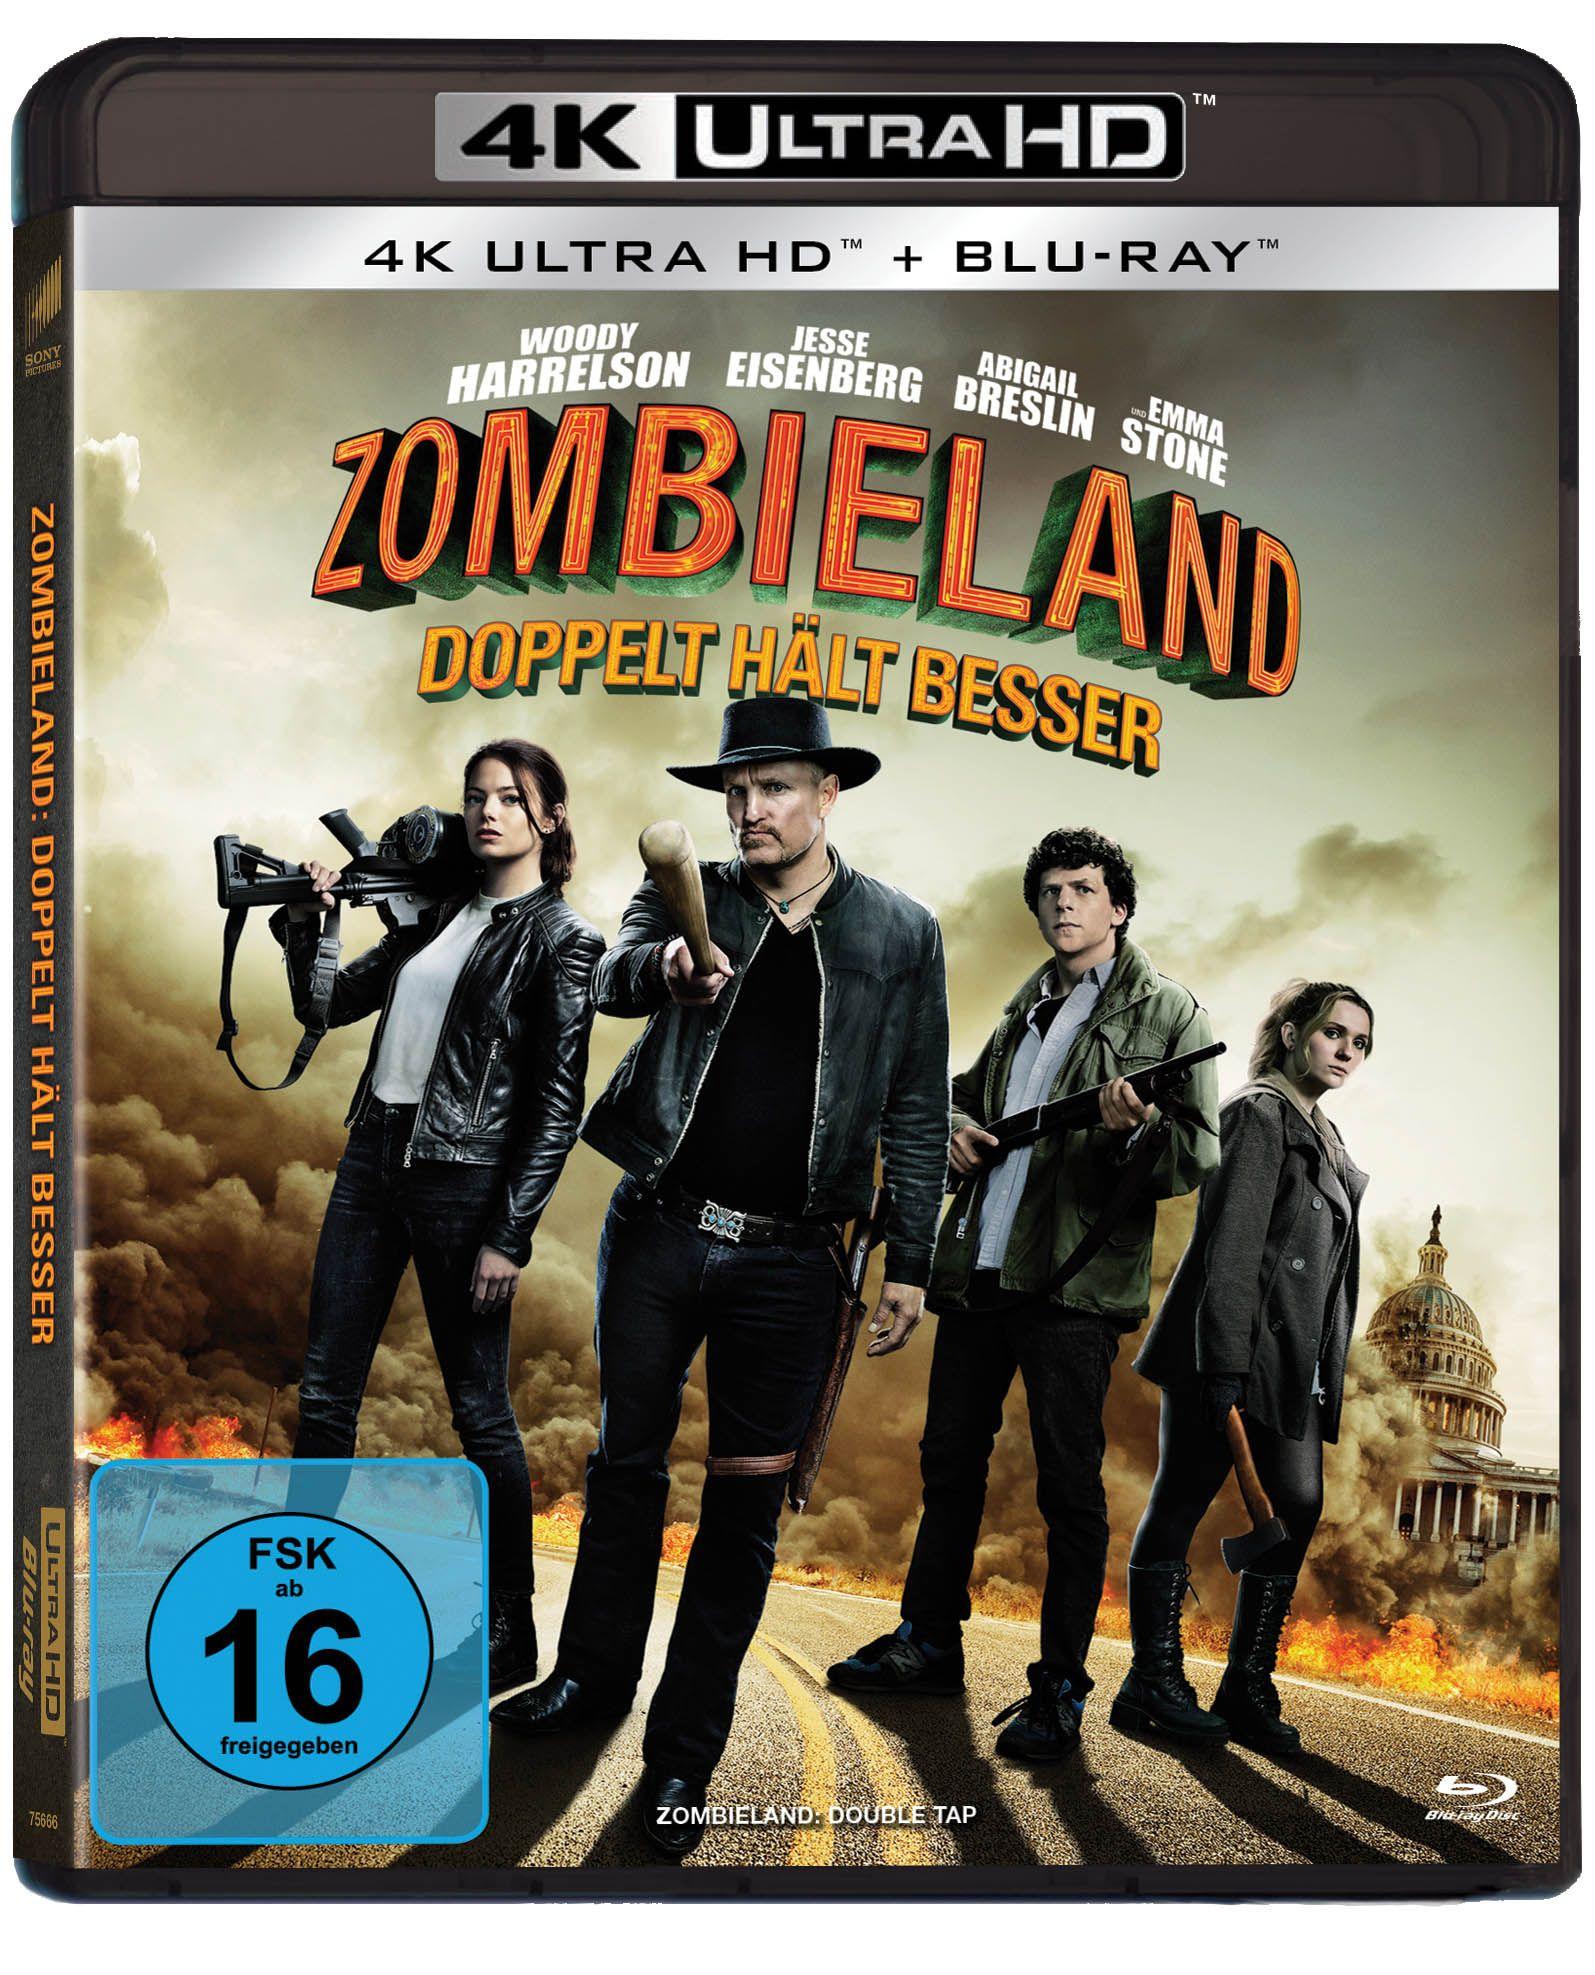 Zombieland Doppelt Halt Besser 4k Ultra Hd Uhd Blu Ray Disc Zombie Blu Ray Zombie Apokalypse